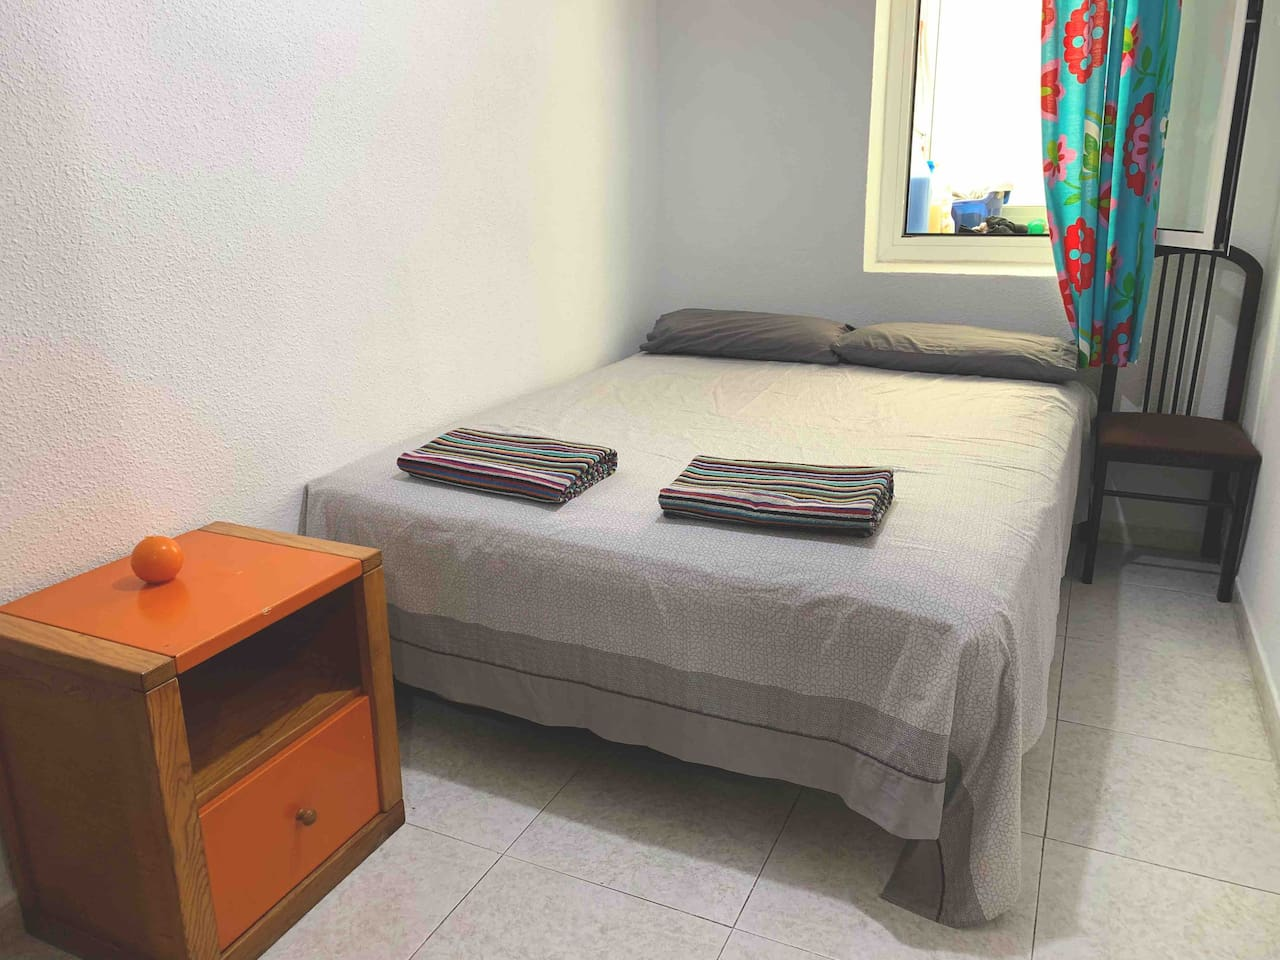 Habitacion, cama doble